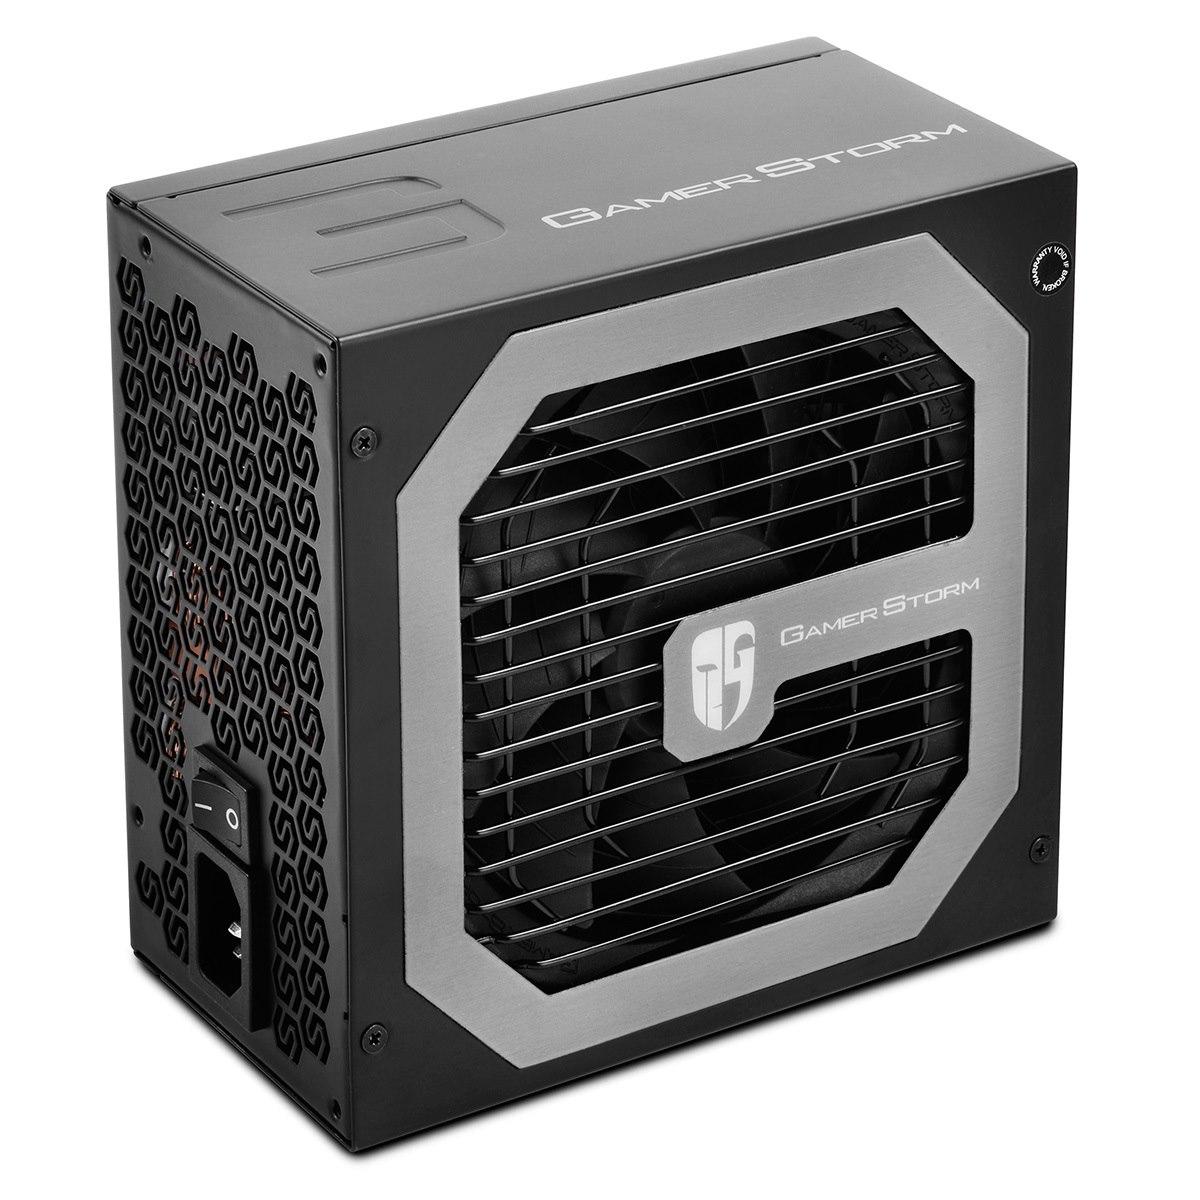 8Ware Deepcool GamerStorm DQ650-M 80+ Gold Certified 100% 650W Modular Psu